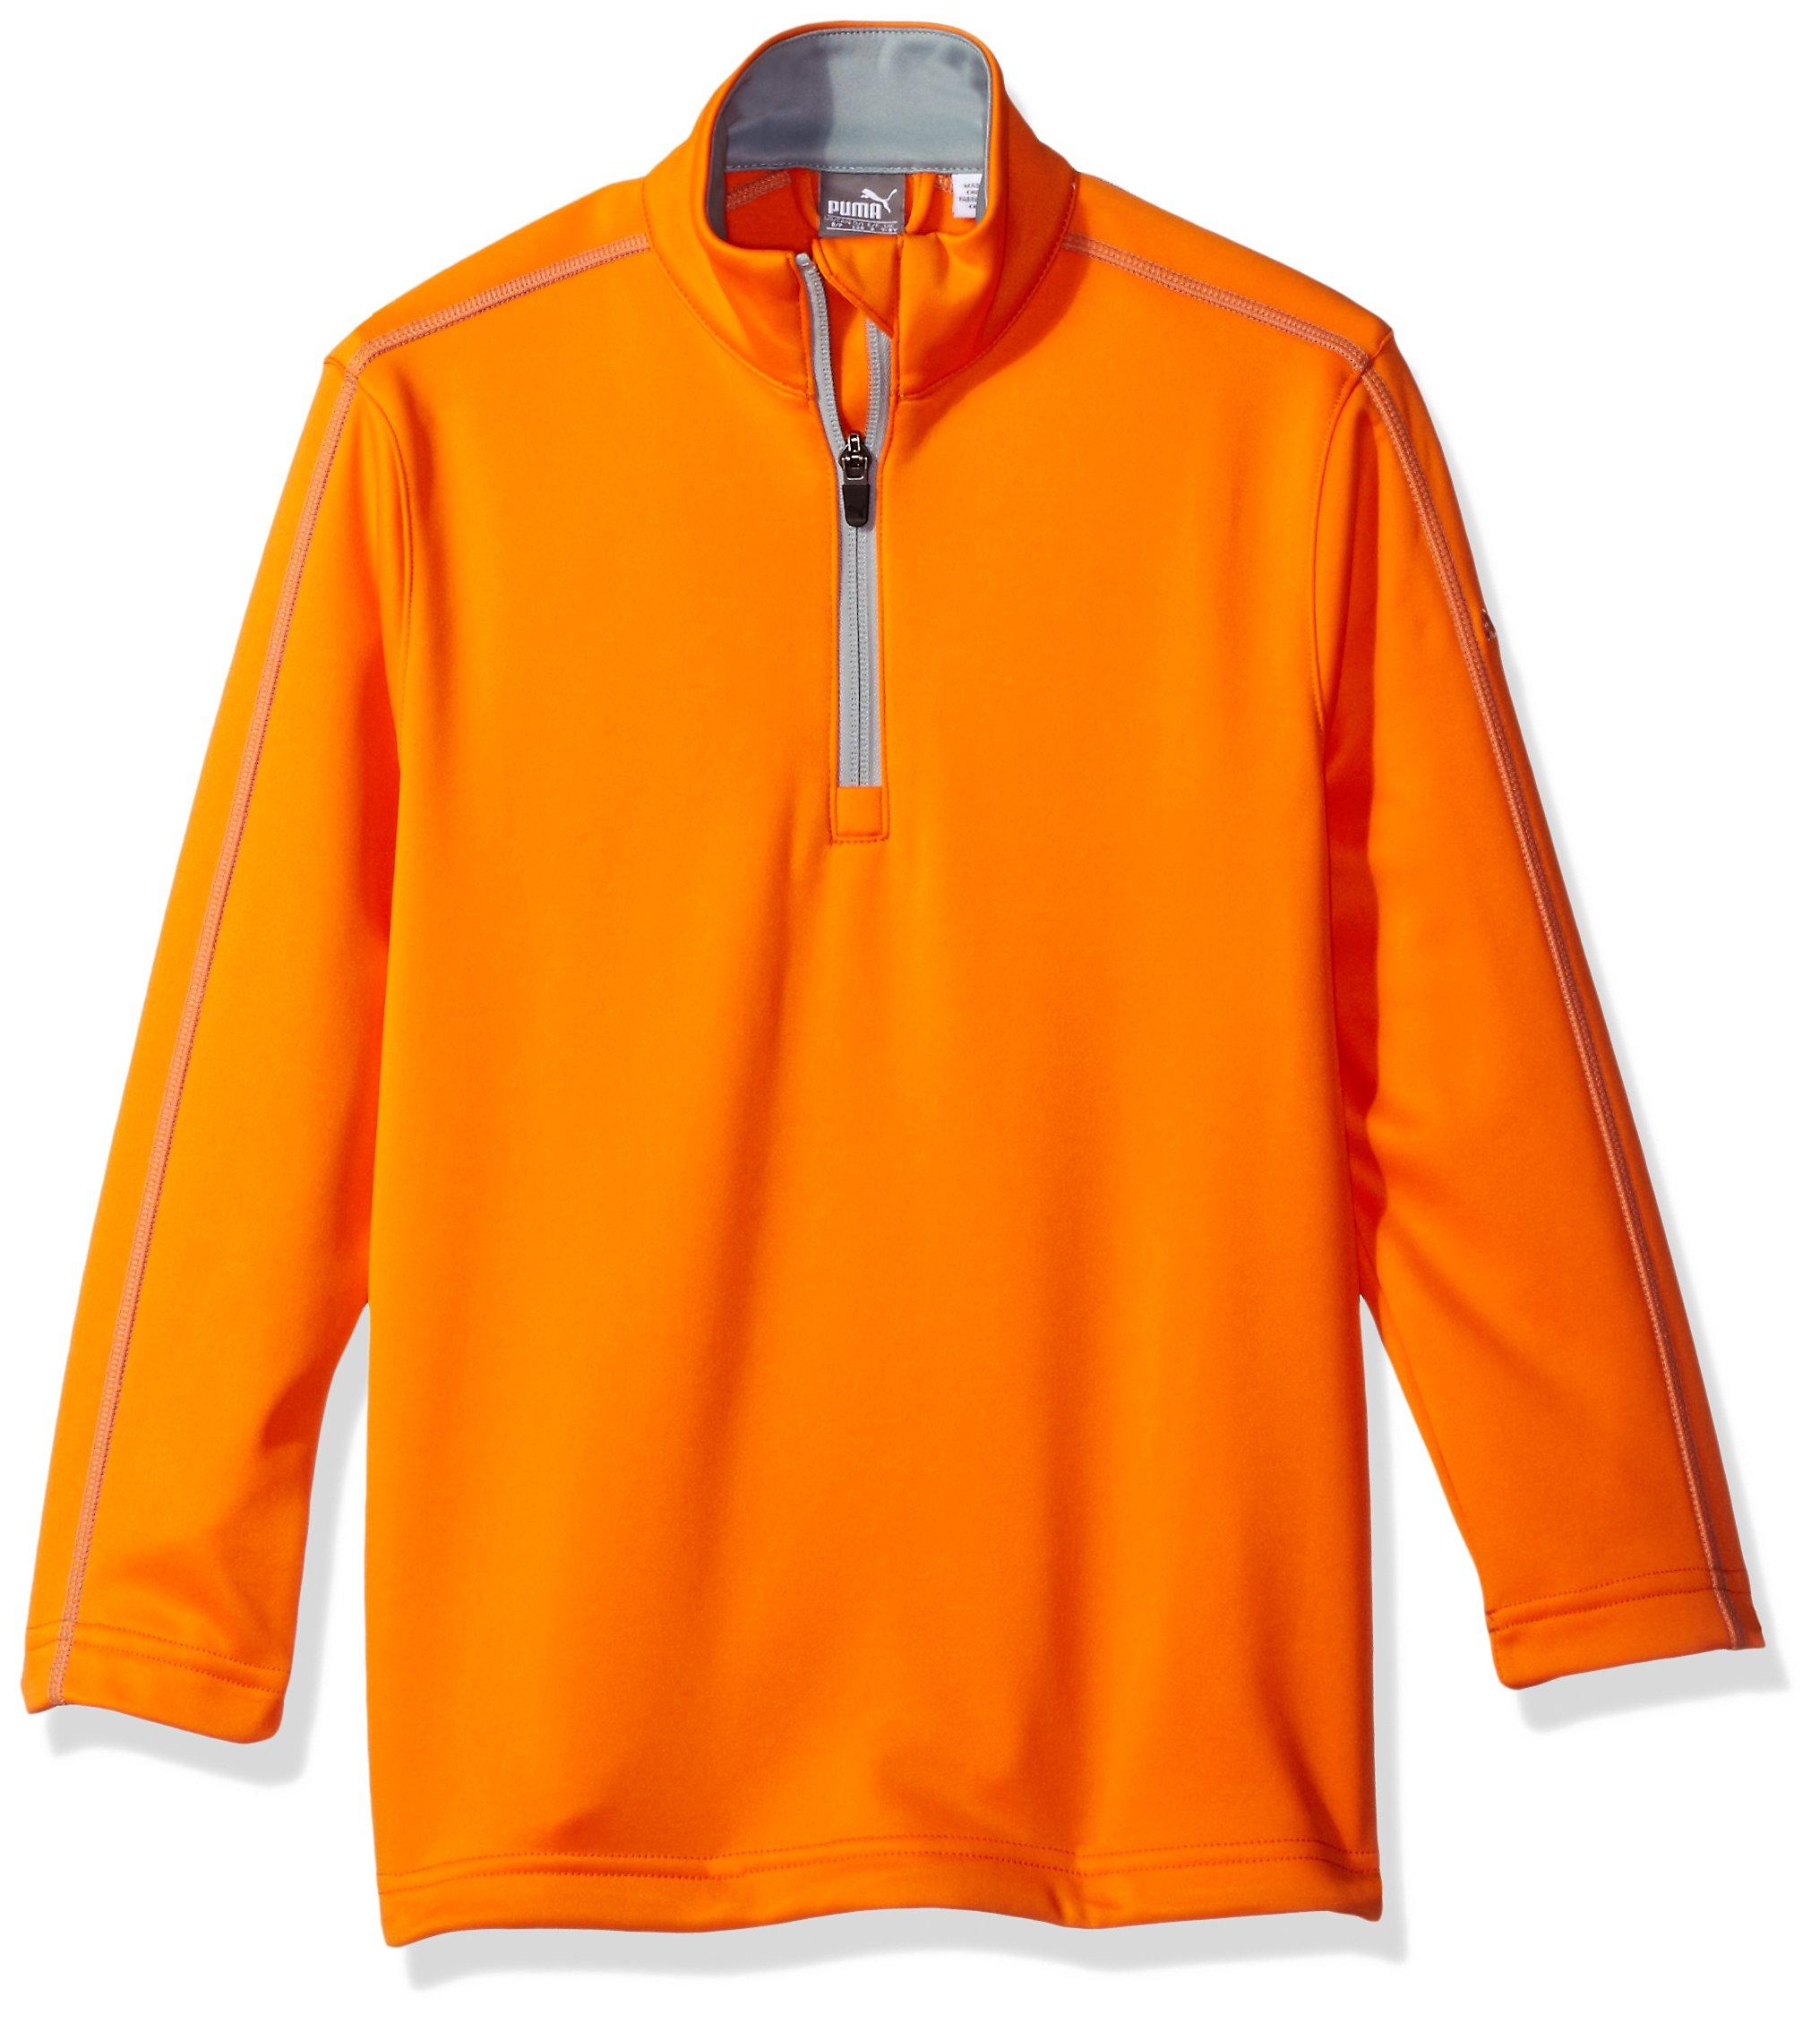 Puma Golf 2017 Kids Fleece 1/4 Zip Popover Vibrant Orange, Large by PUMA